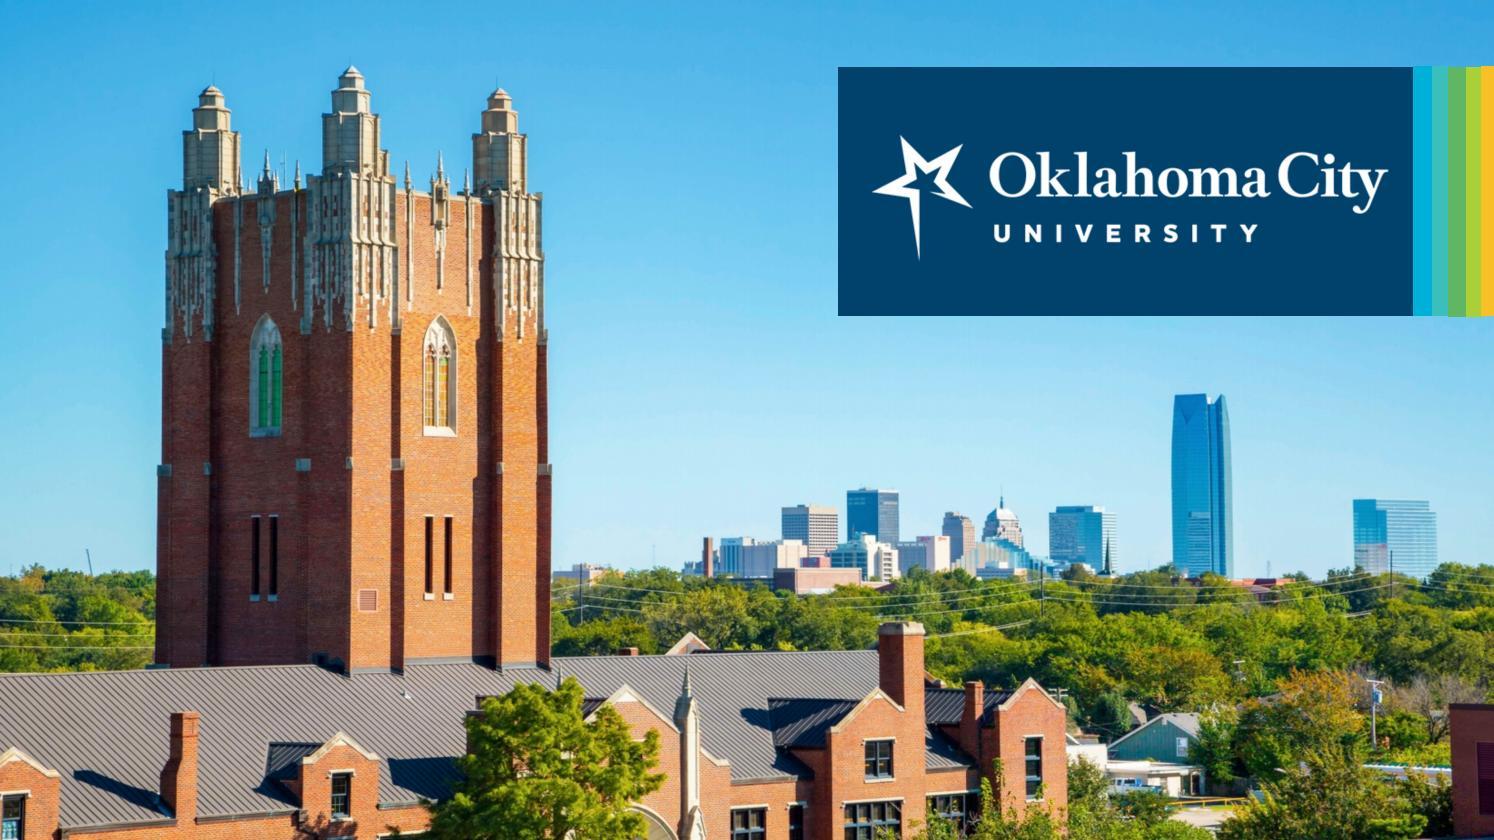 2019 20 Oklahoma City University Viewbook By Oklahoma City University Issuu